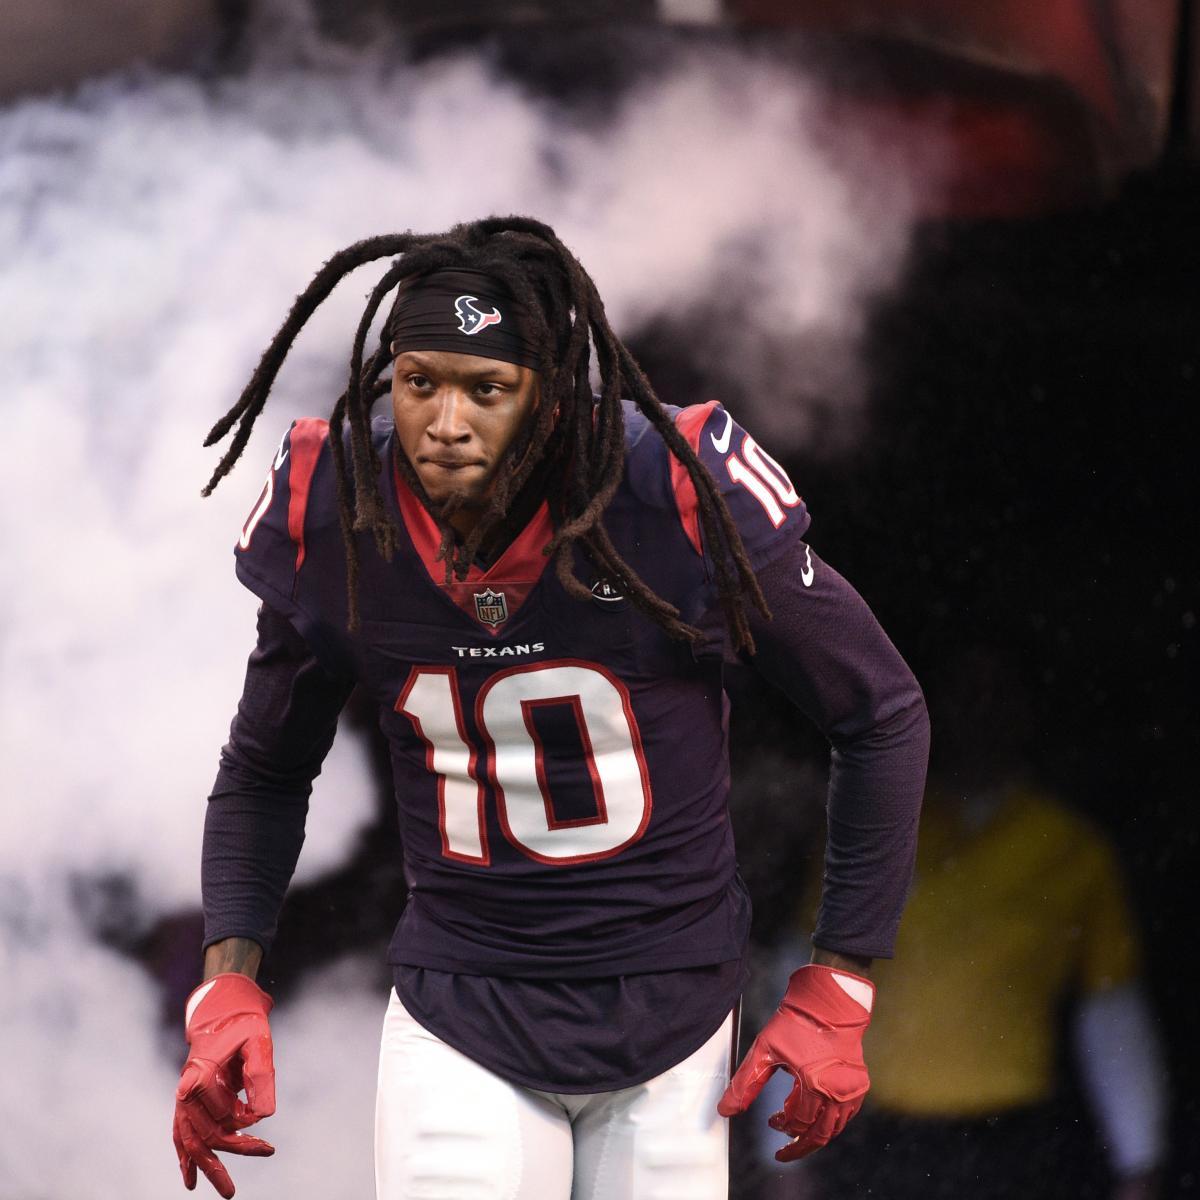 2019 Fantasy Football Big Board: Injuries, Holdouts Shaking Up Rankings